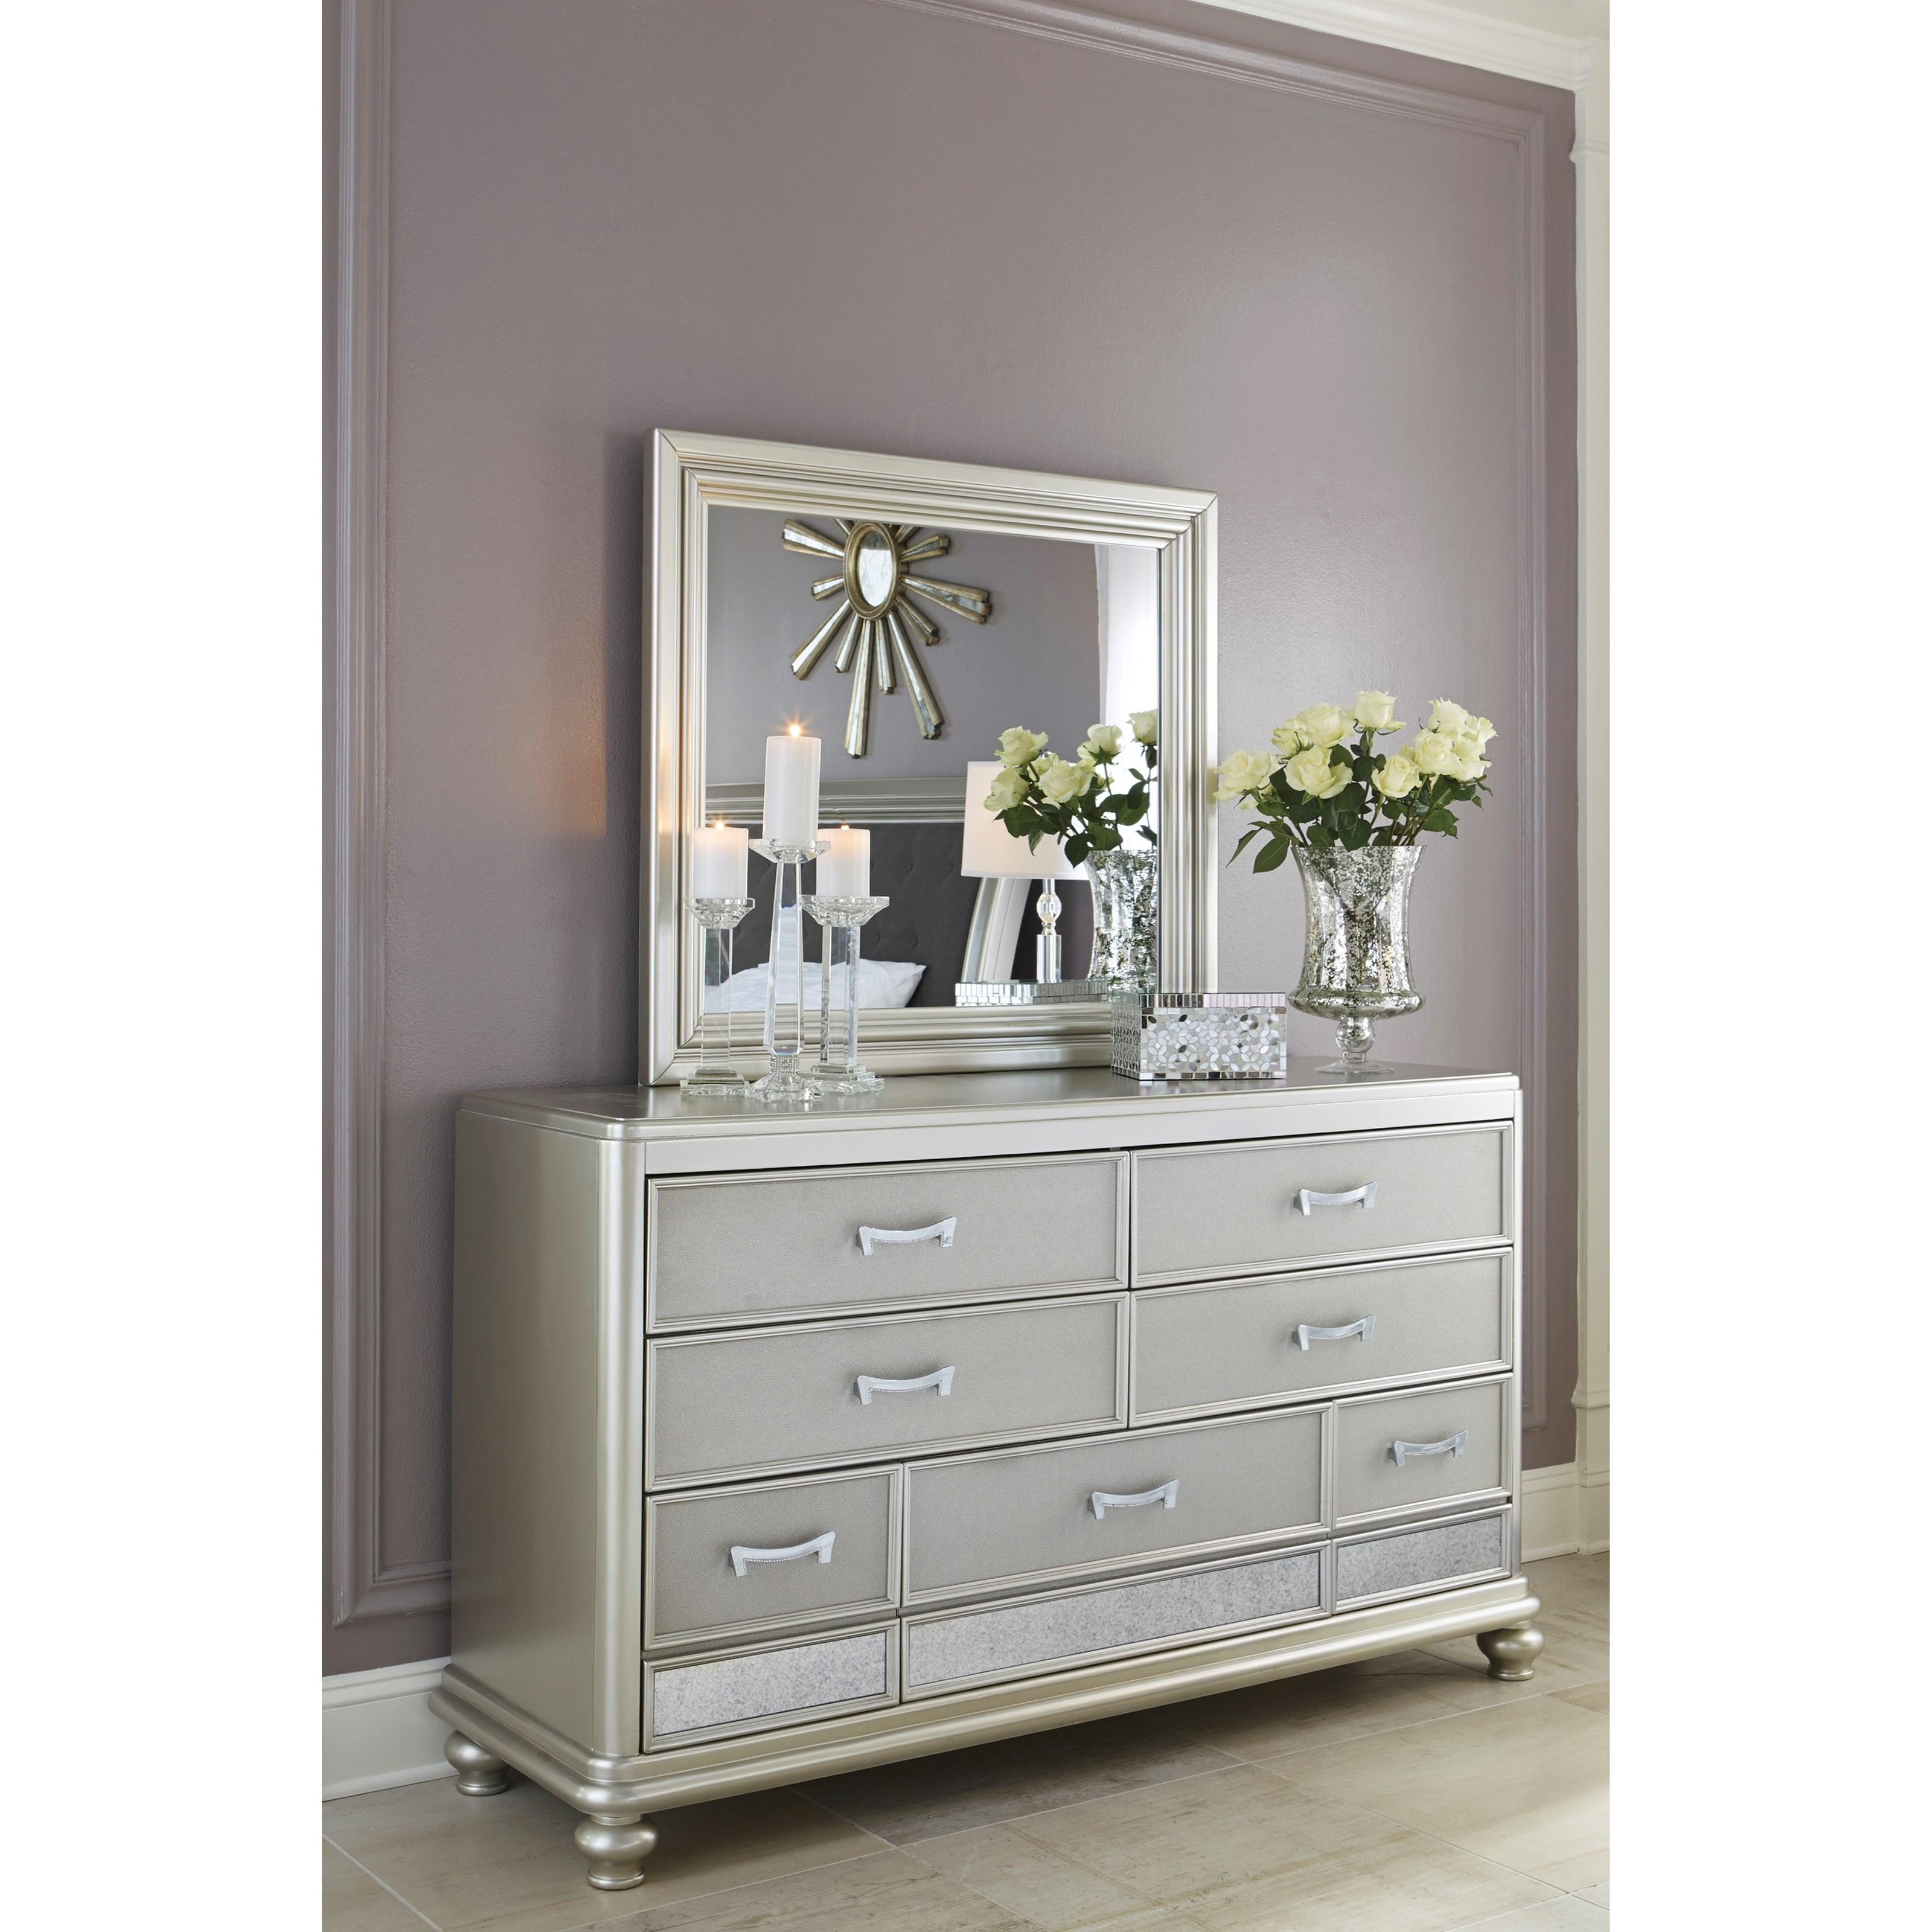 Signature Design By Ashley Coralayne B650 31 Dresser In Silver Paint Finish John V Schultz